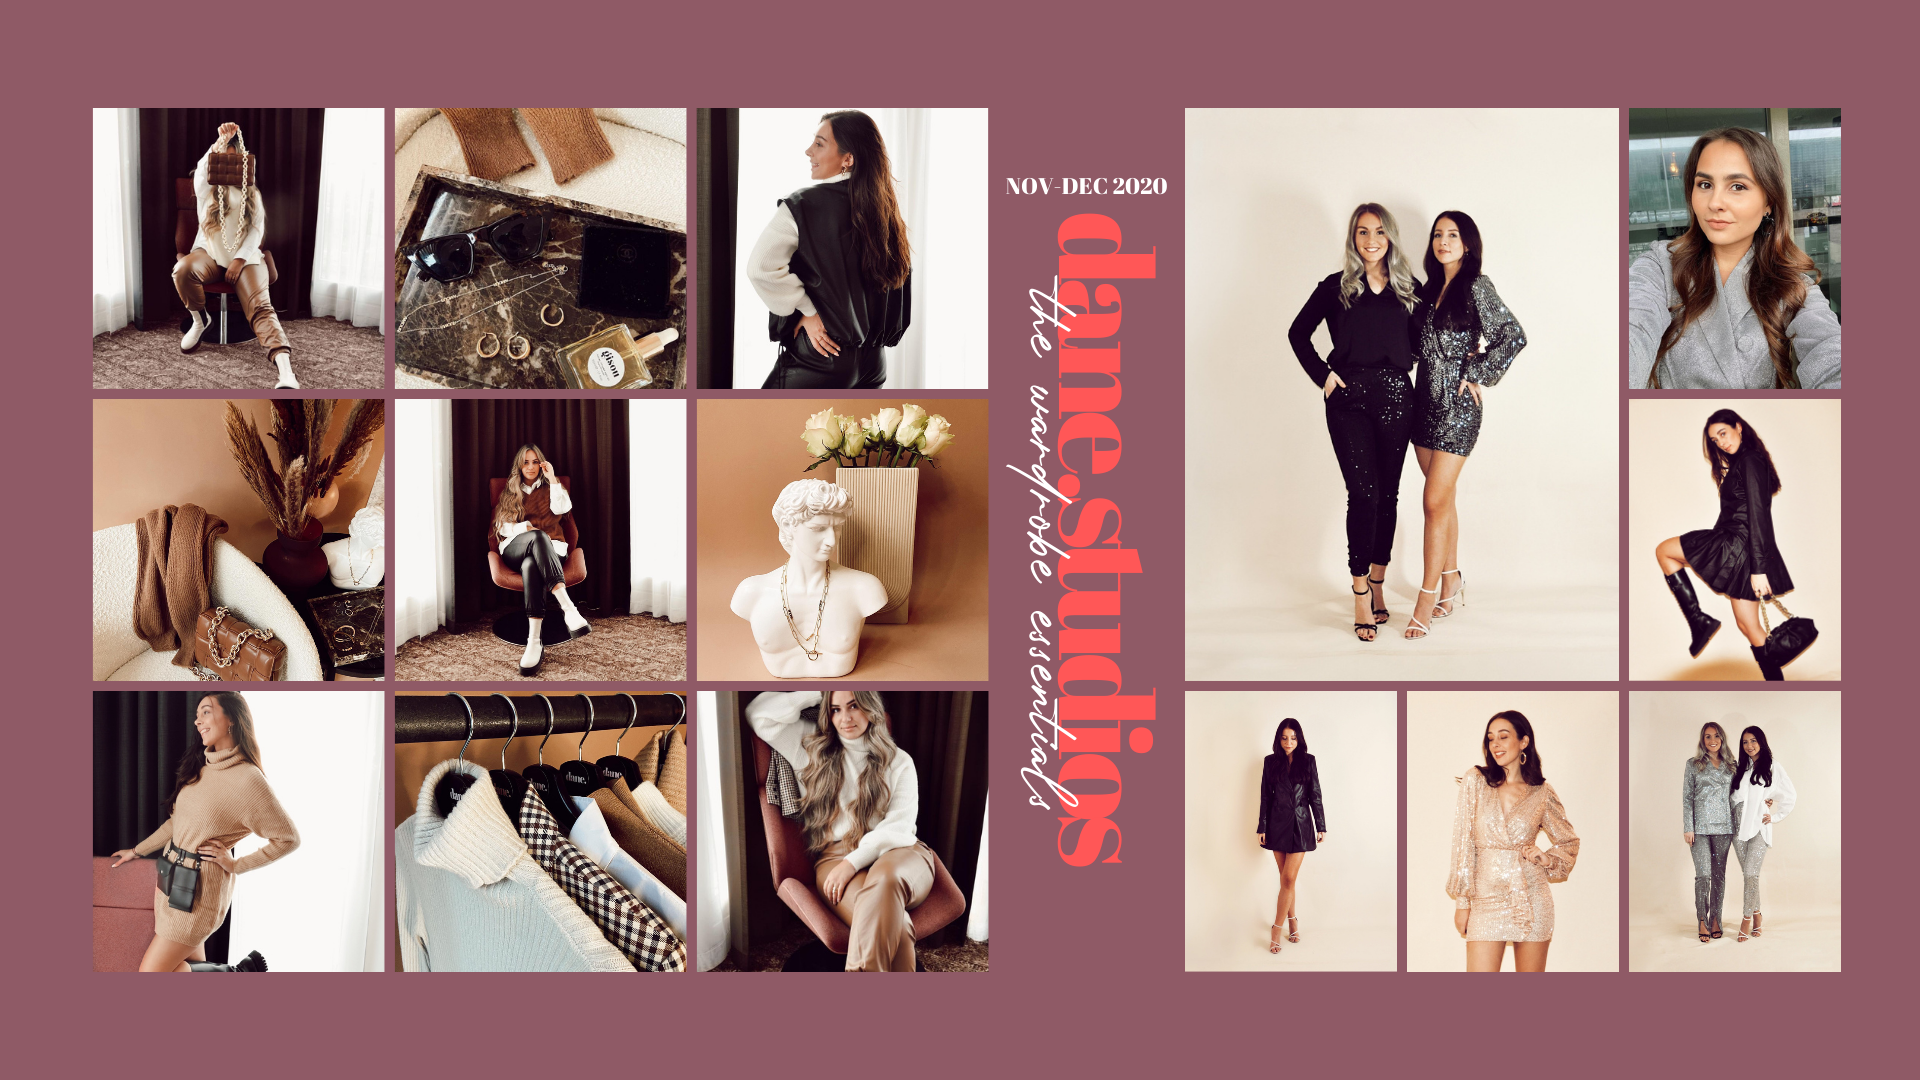 Danestudios collectie kleding webshop